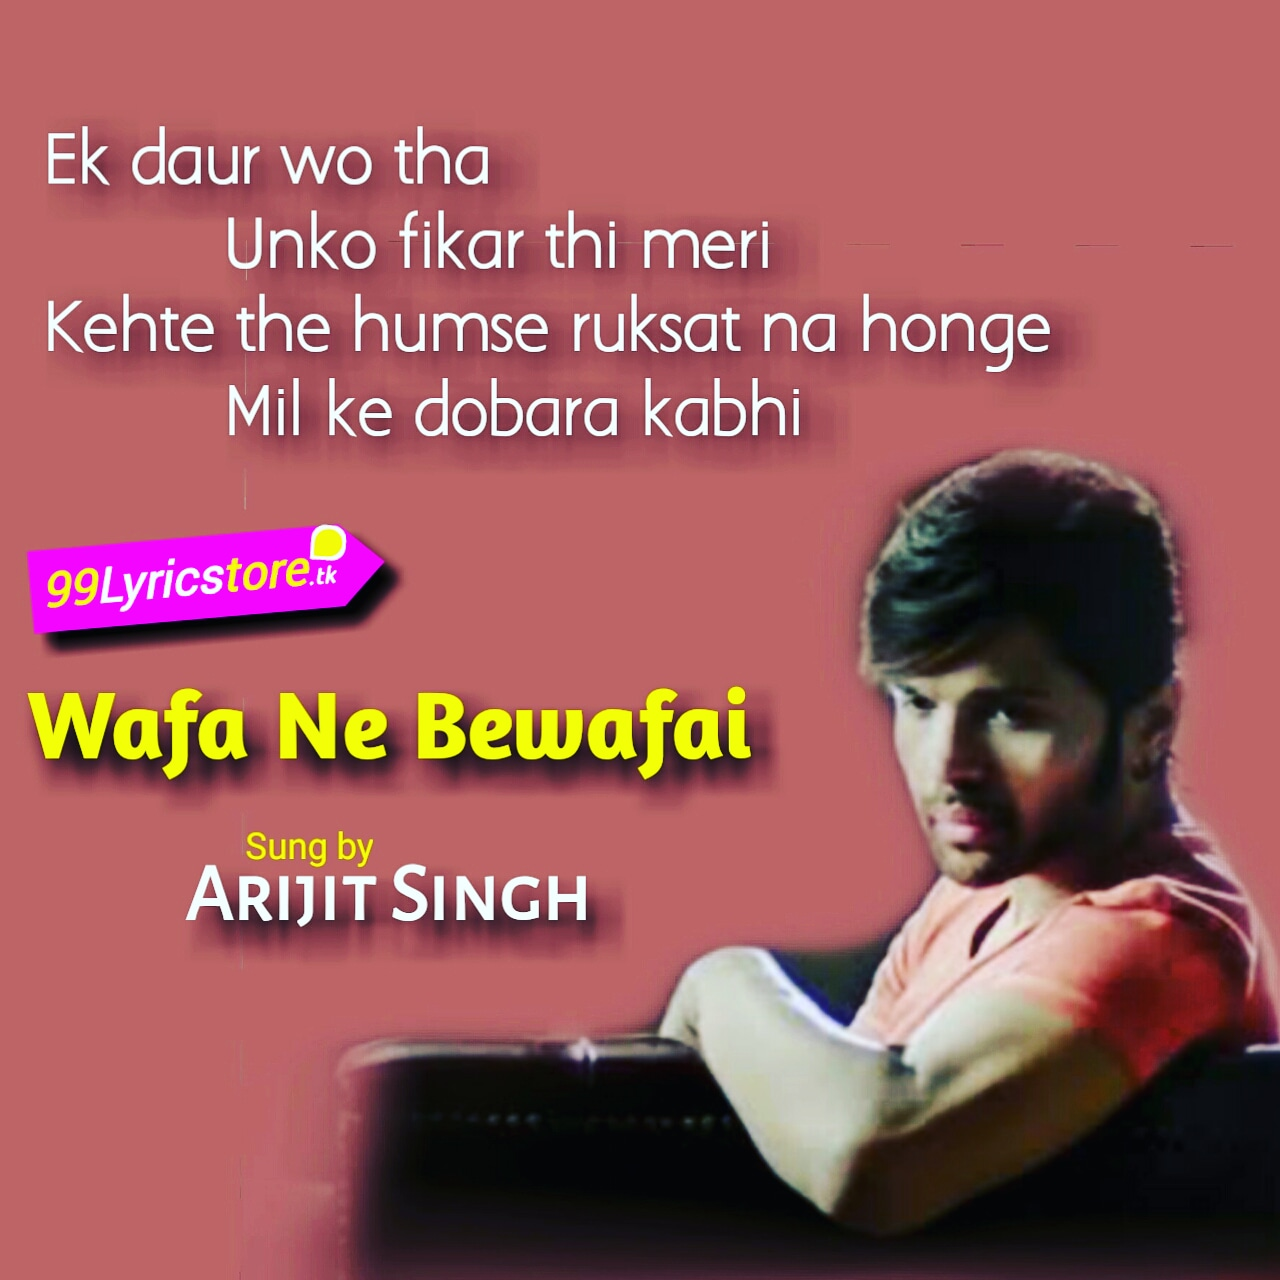 Arijit Singh Song Lyrics, Himesh Reshmiya Song Lyrics, Top Bollywood Song Lyrics, Top Arijit Singh Song Lyrics, Hindi Song Lyrics